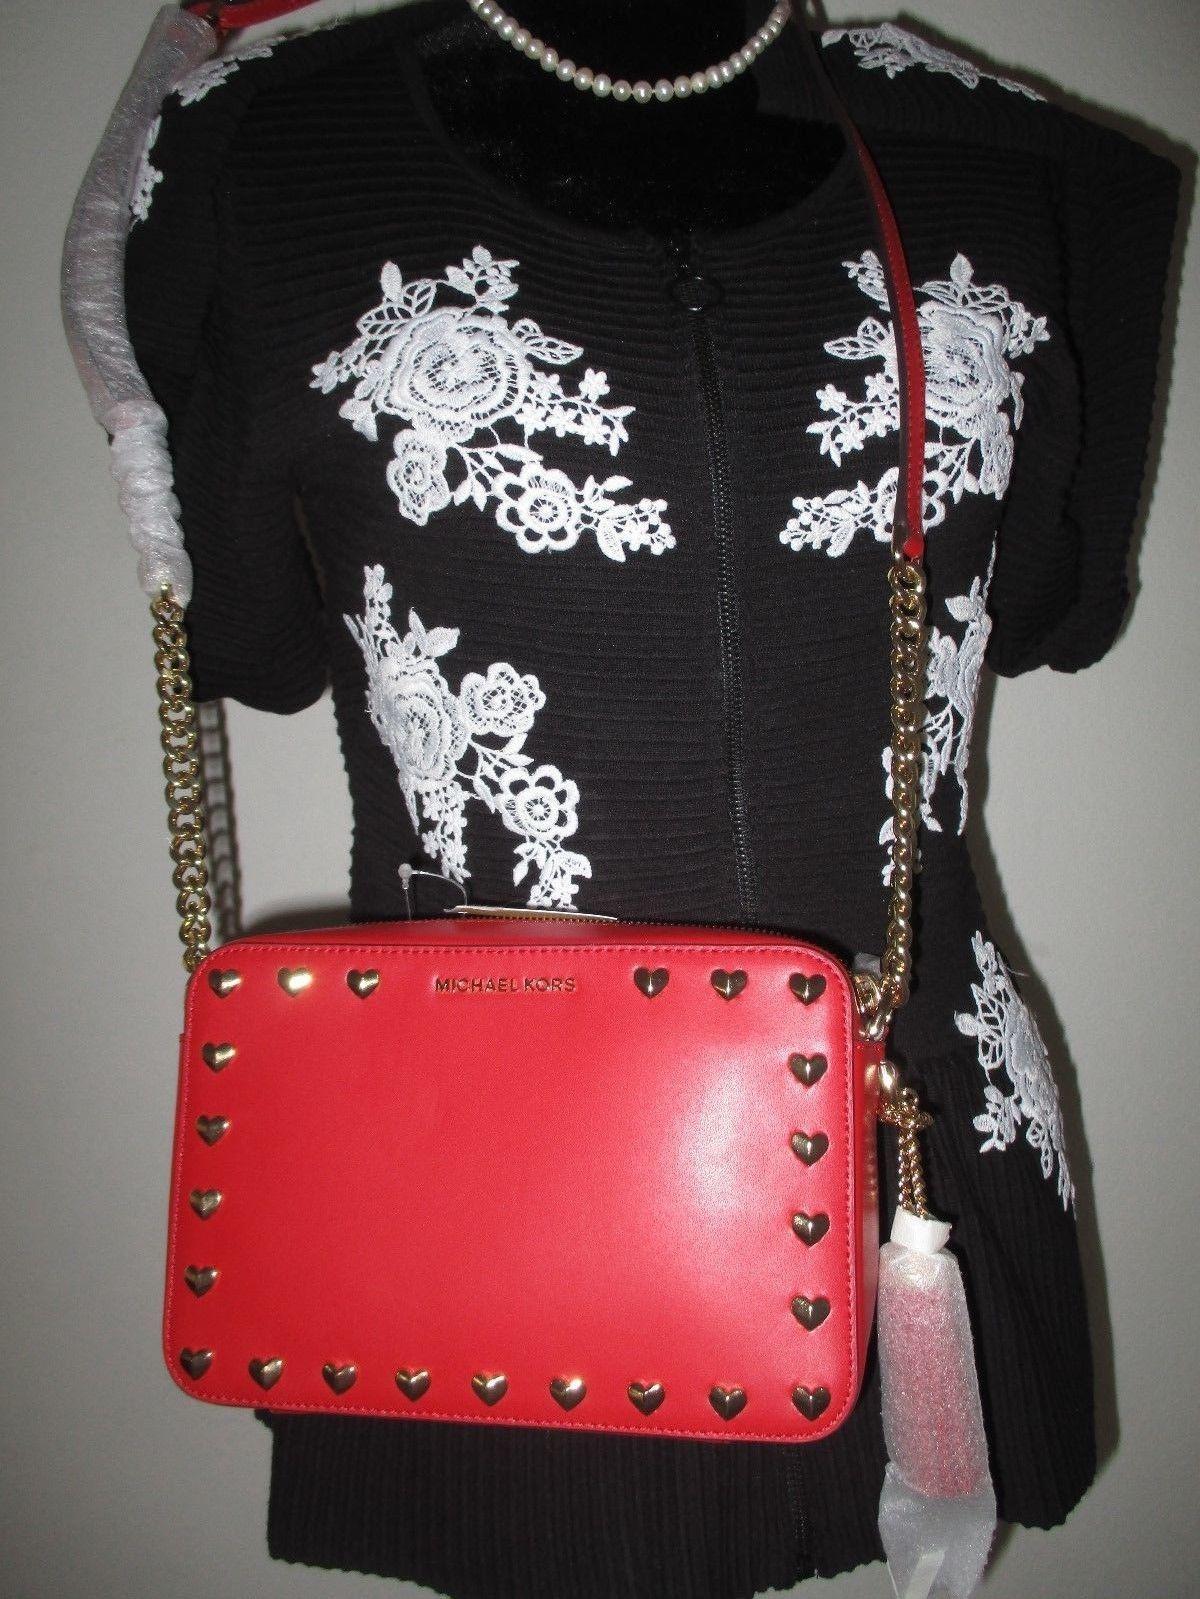 001c7e314c3c MICHAEL KORS Ginny Medium Camera Bag Red Gold Hearts Crossbody ...